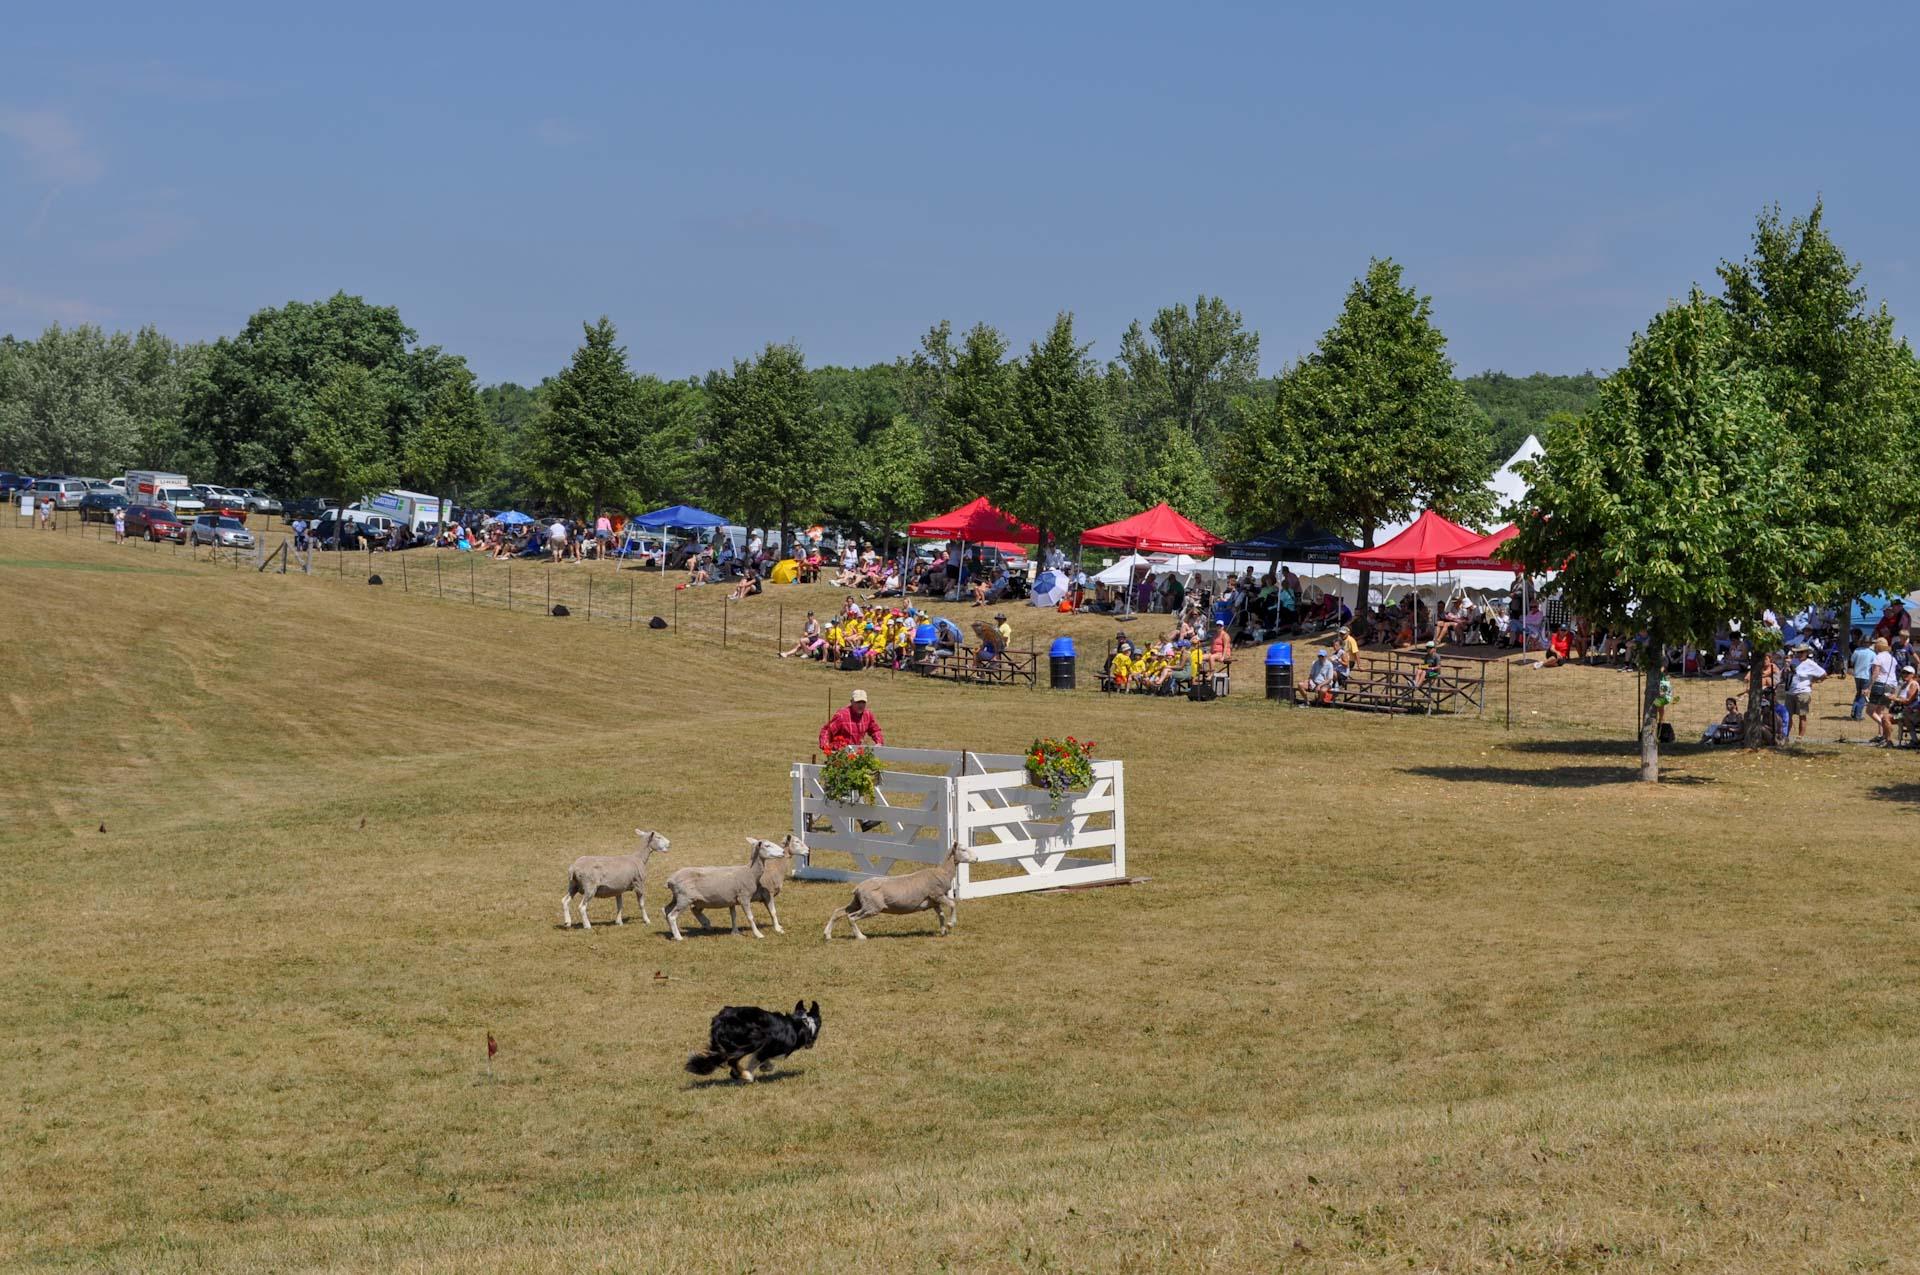 Kingston Sheepdog Trials take over Grass Creek Park this weekend